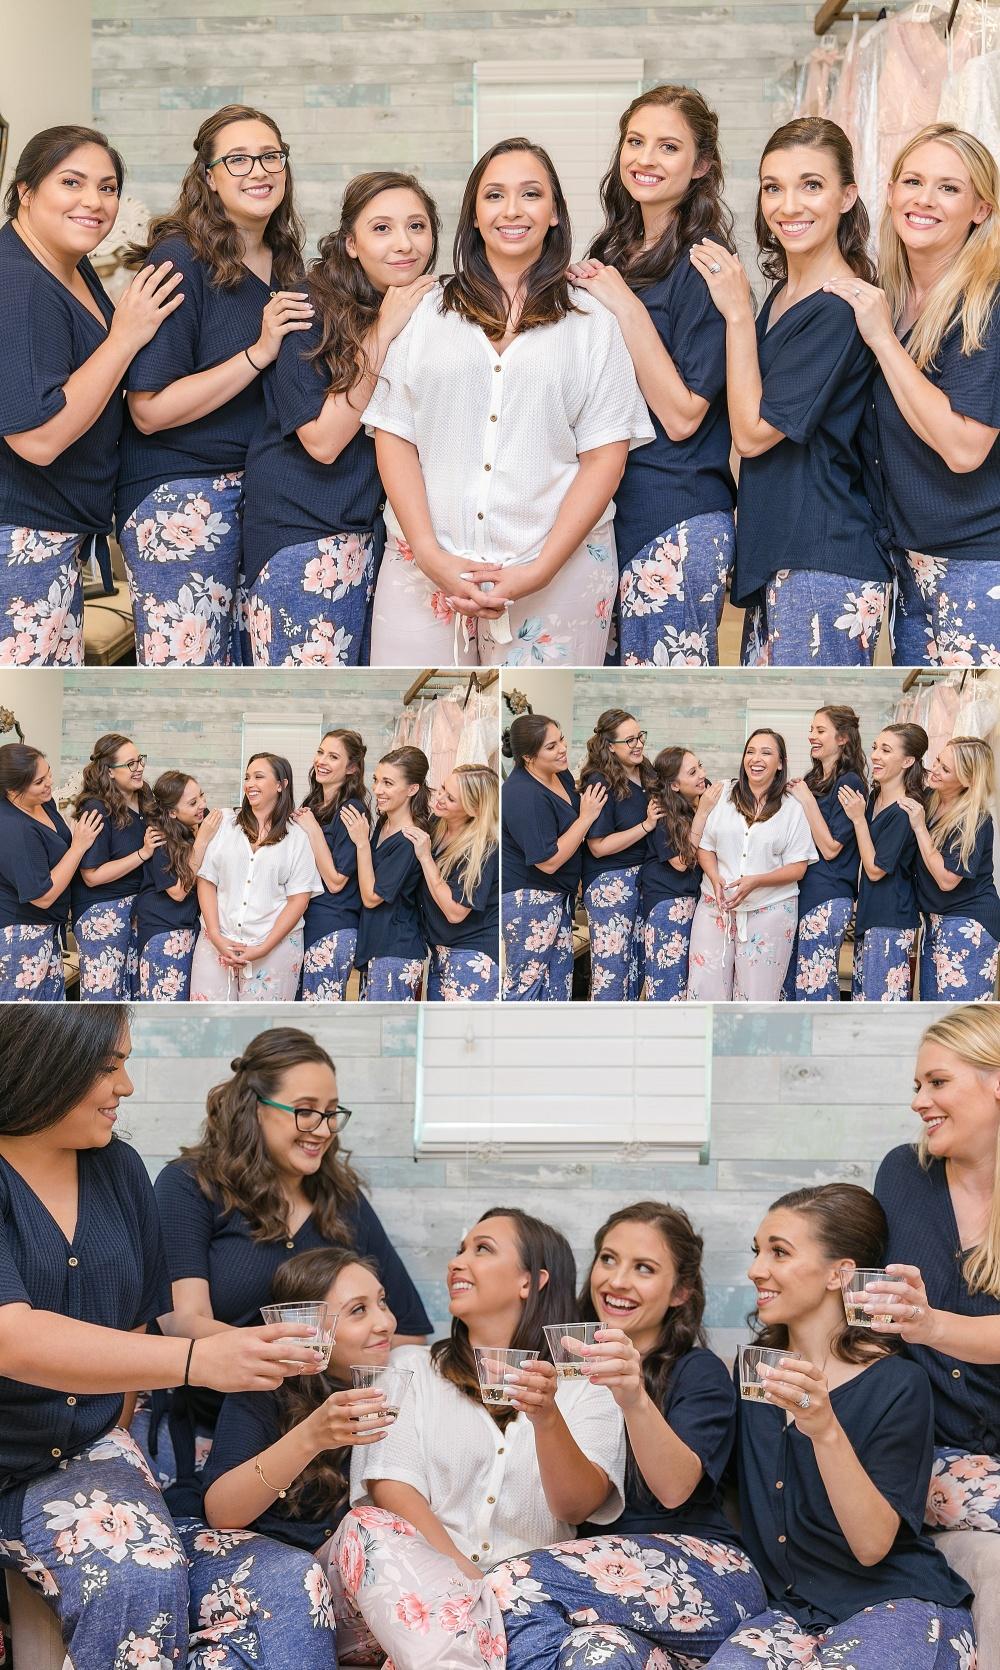 Wedding-Photographer-Bulverde-Texas-Western-Sky-Event-Venue-Carly-Barton-Photography_0030.jpg